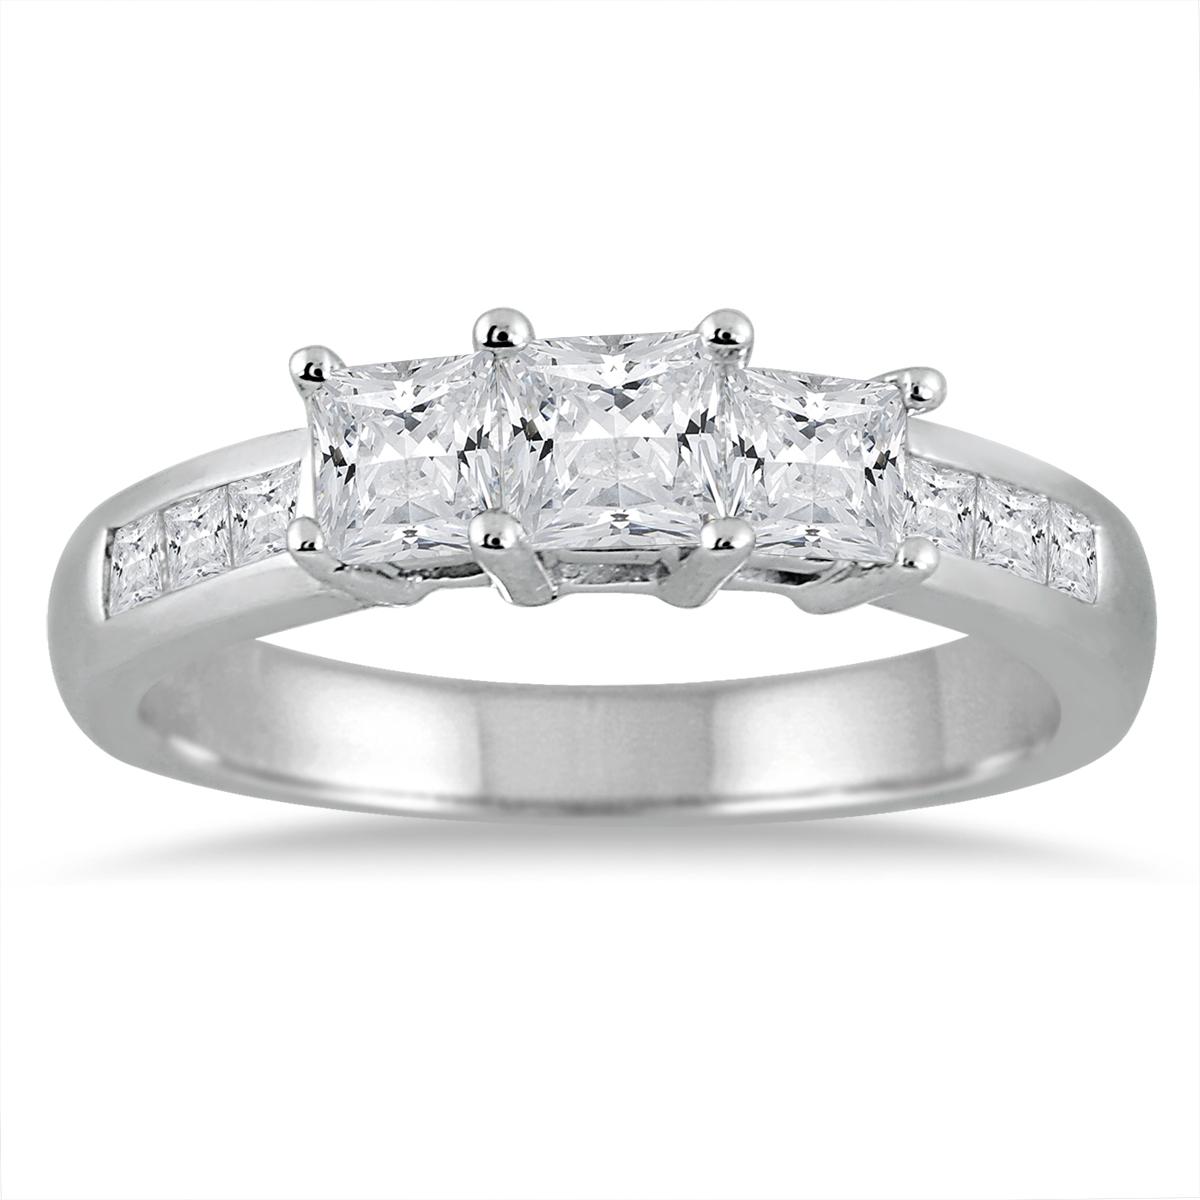 1 1/2 Carat TW Princess Cut Diamond Three Stone Ring in 14K White Gold